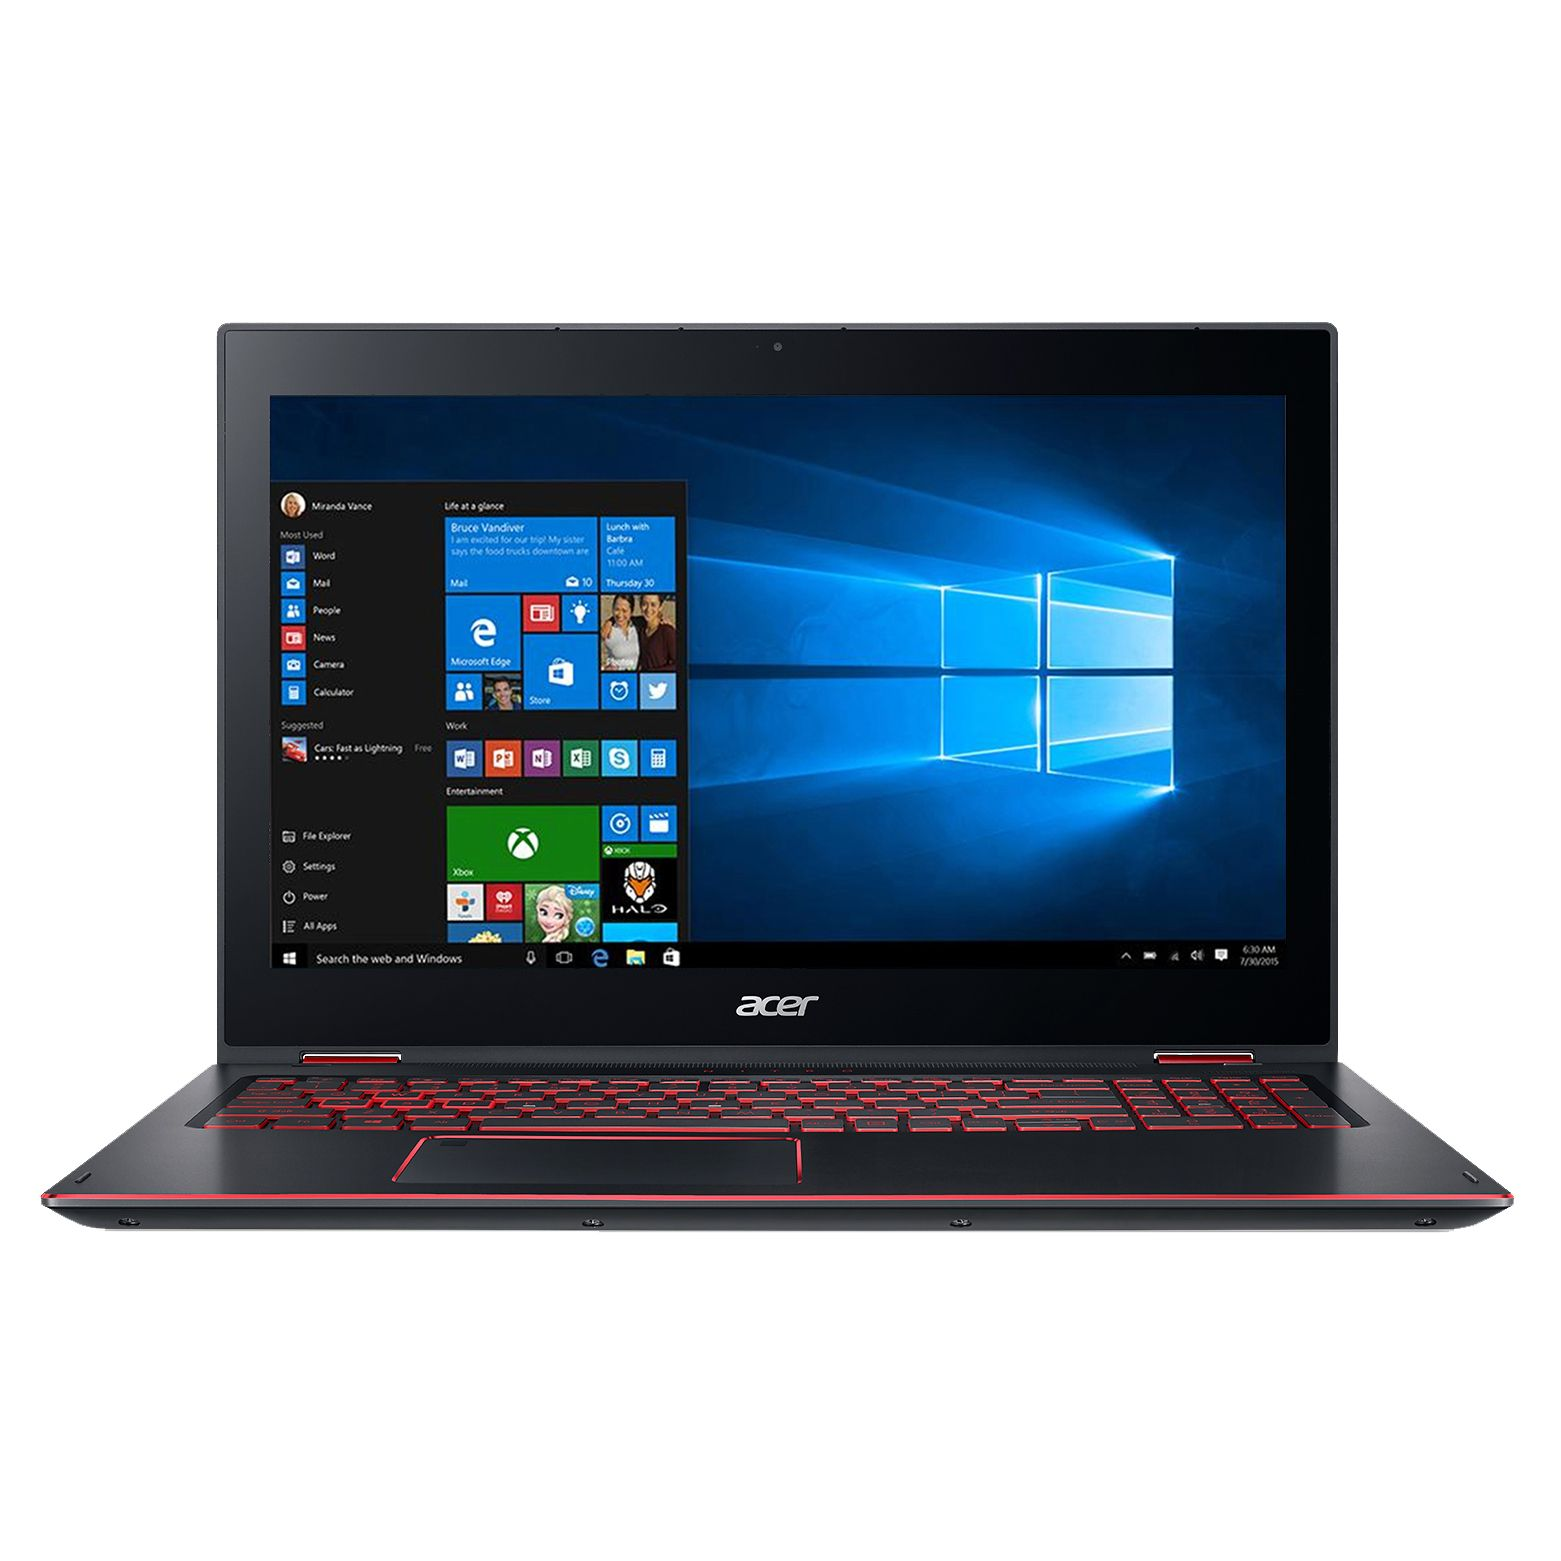 Notebook Acer Nitro Spin 5 NP515-51 15.6 Full HD Touch Intel Core i5-8250U GTX 1050-4GB RAM 8GB SSD 256GB Windows 10 Home Negru